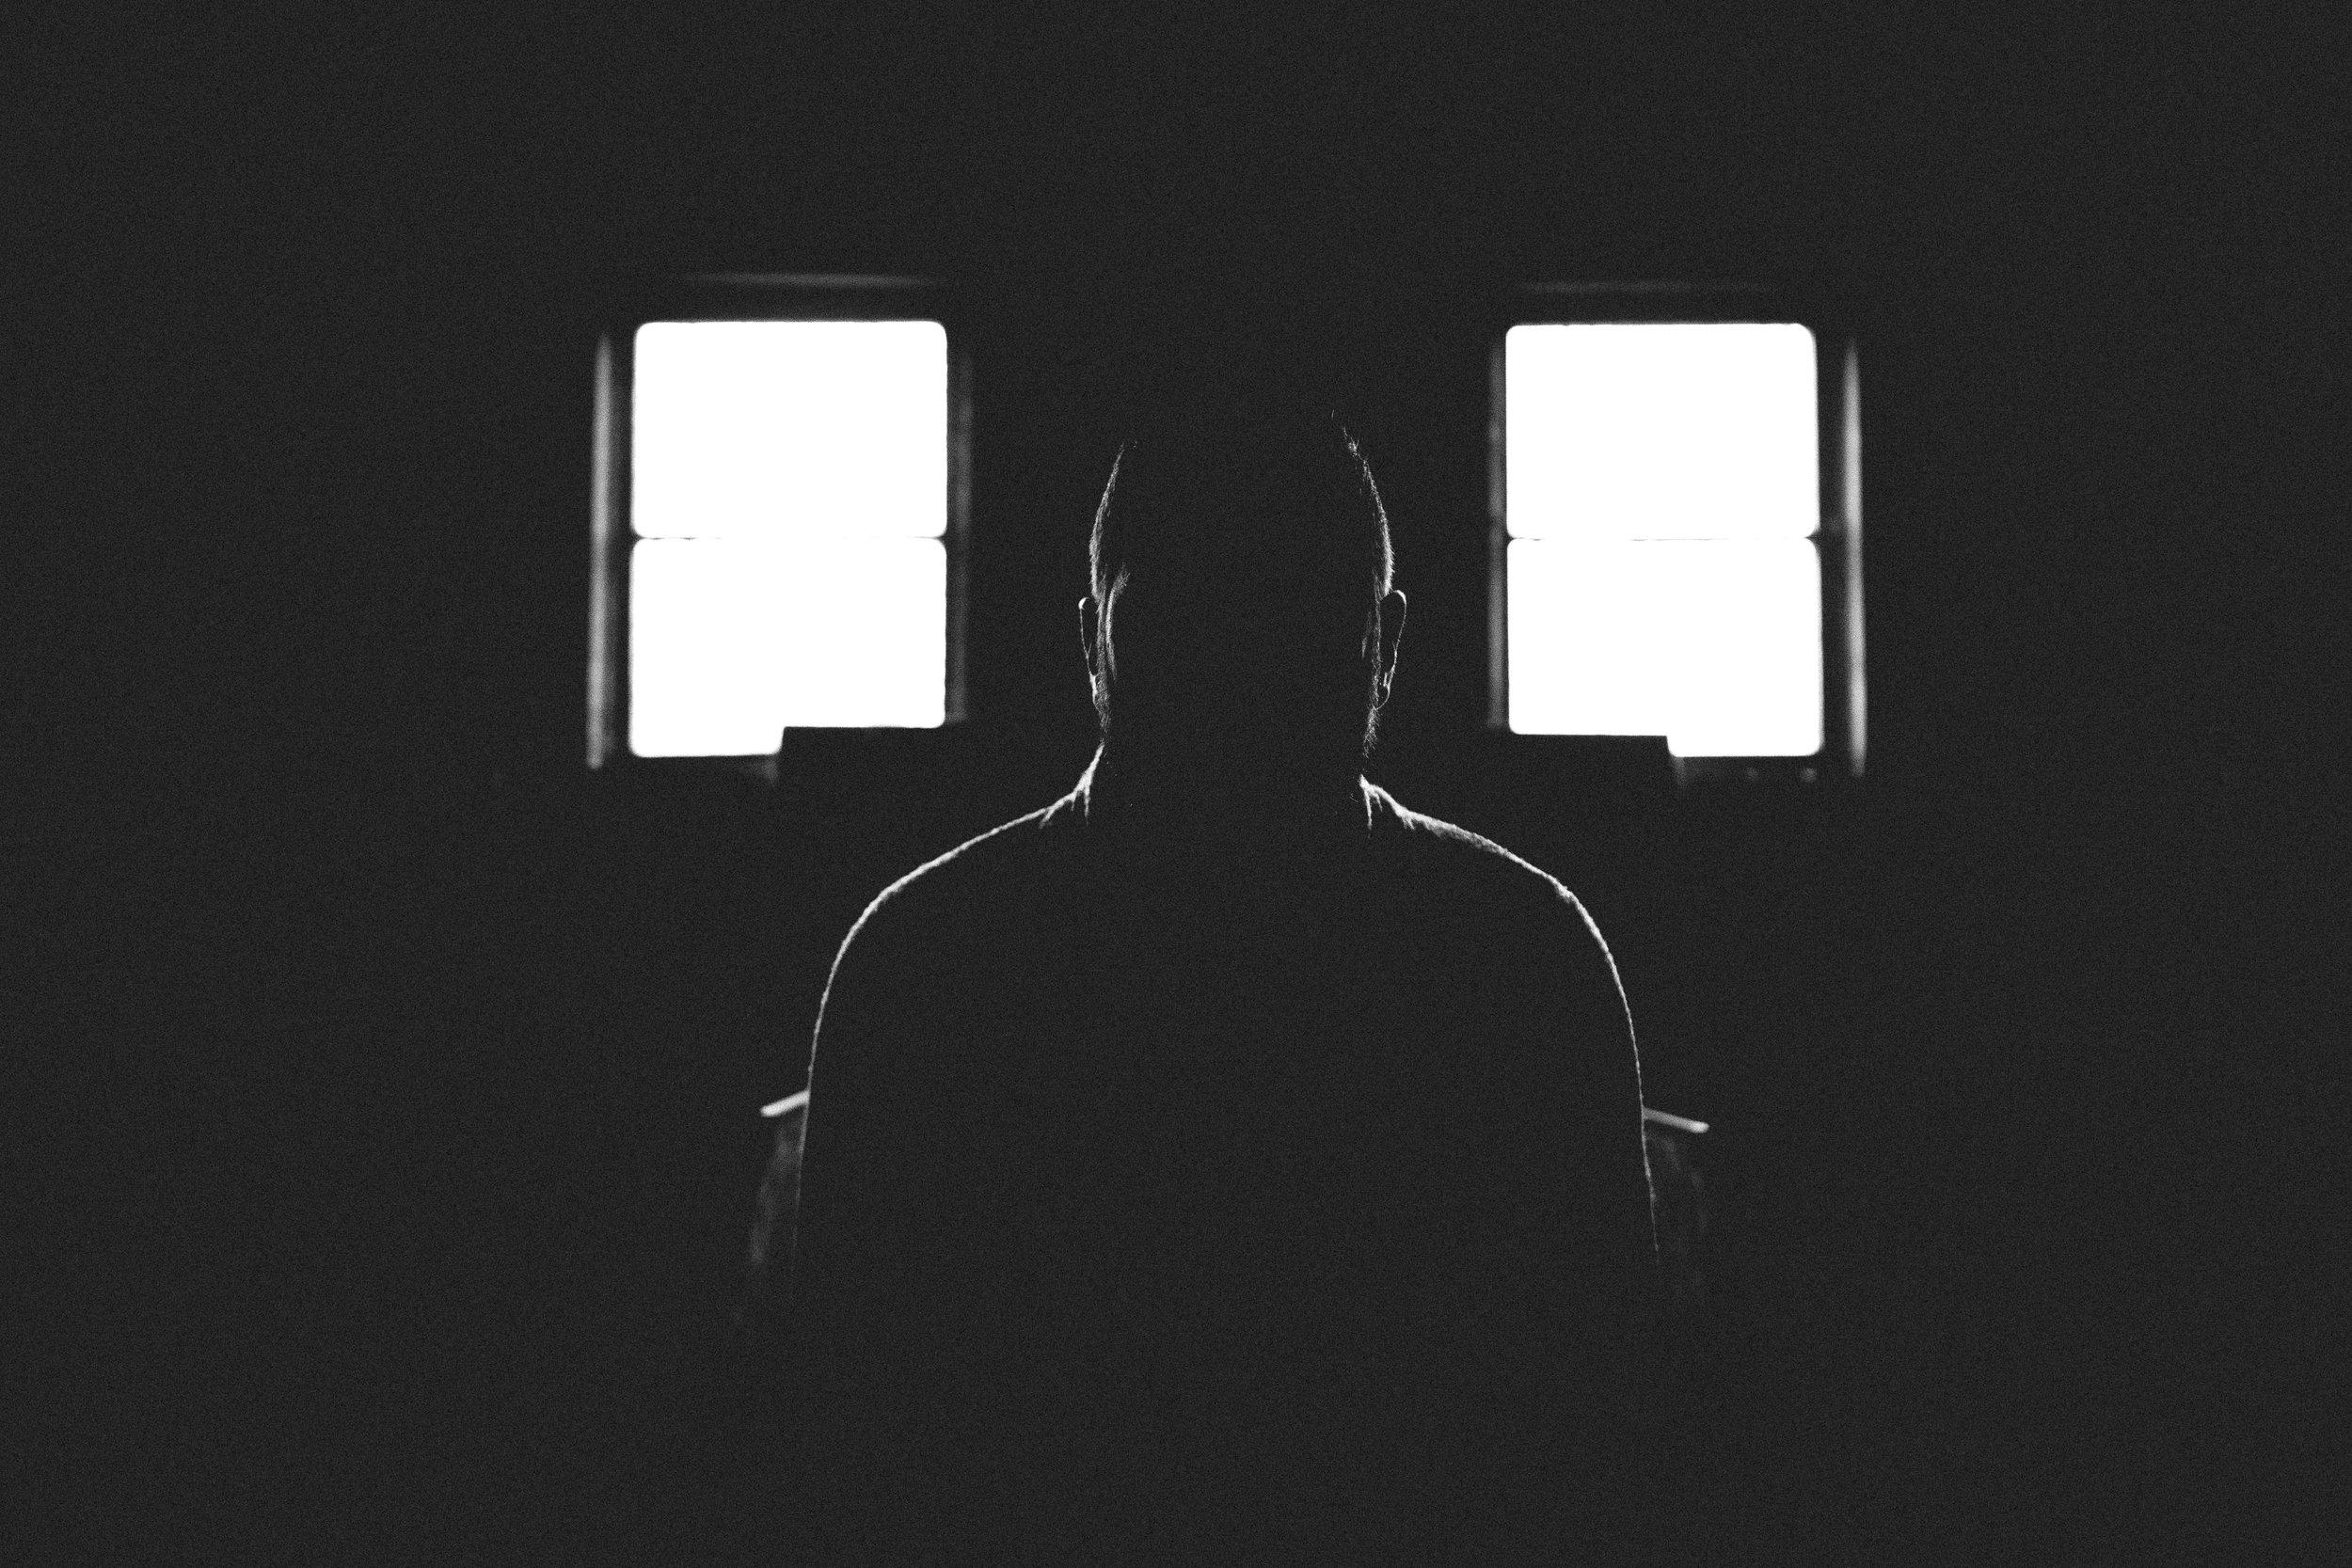 alone-black-black-and-white-78015.jpg